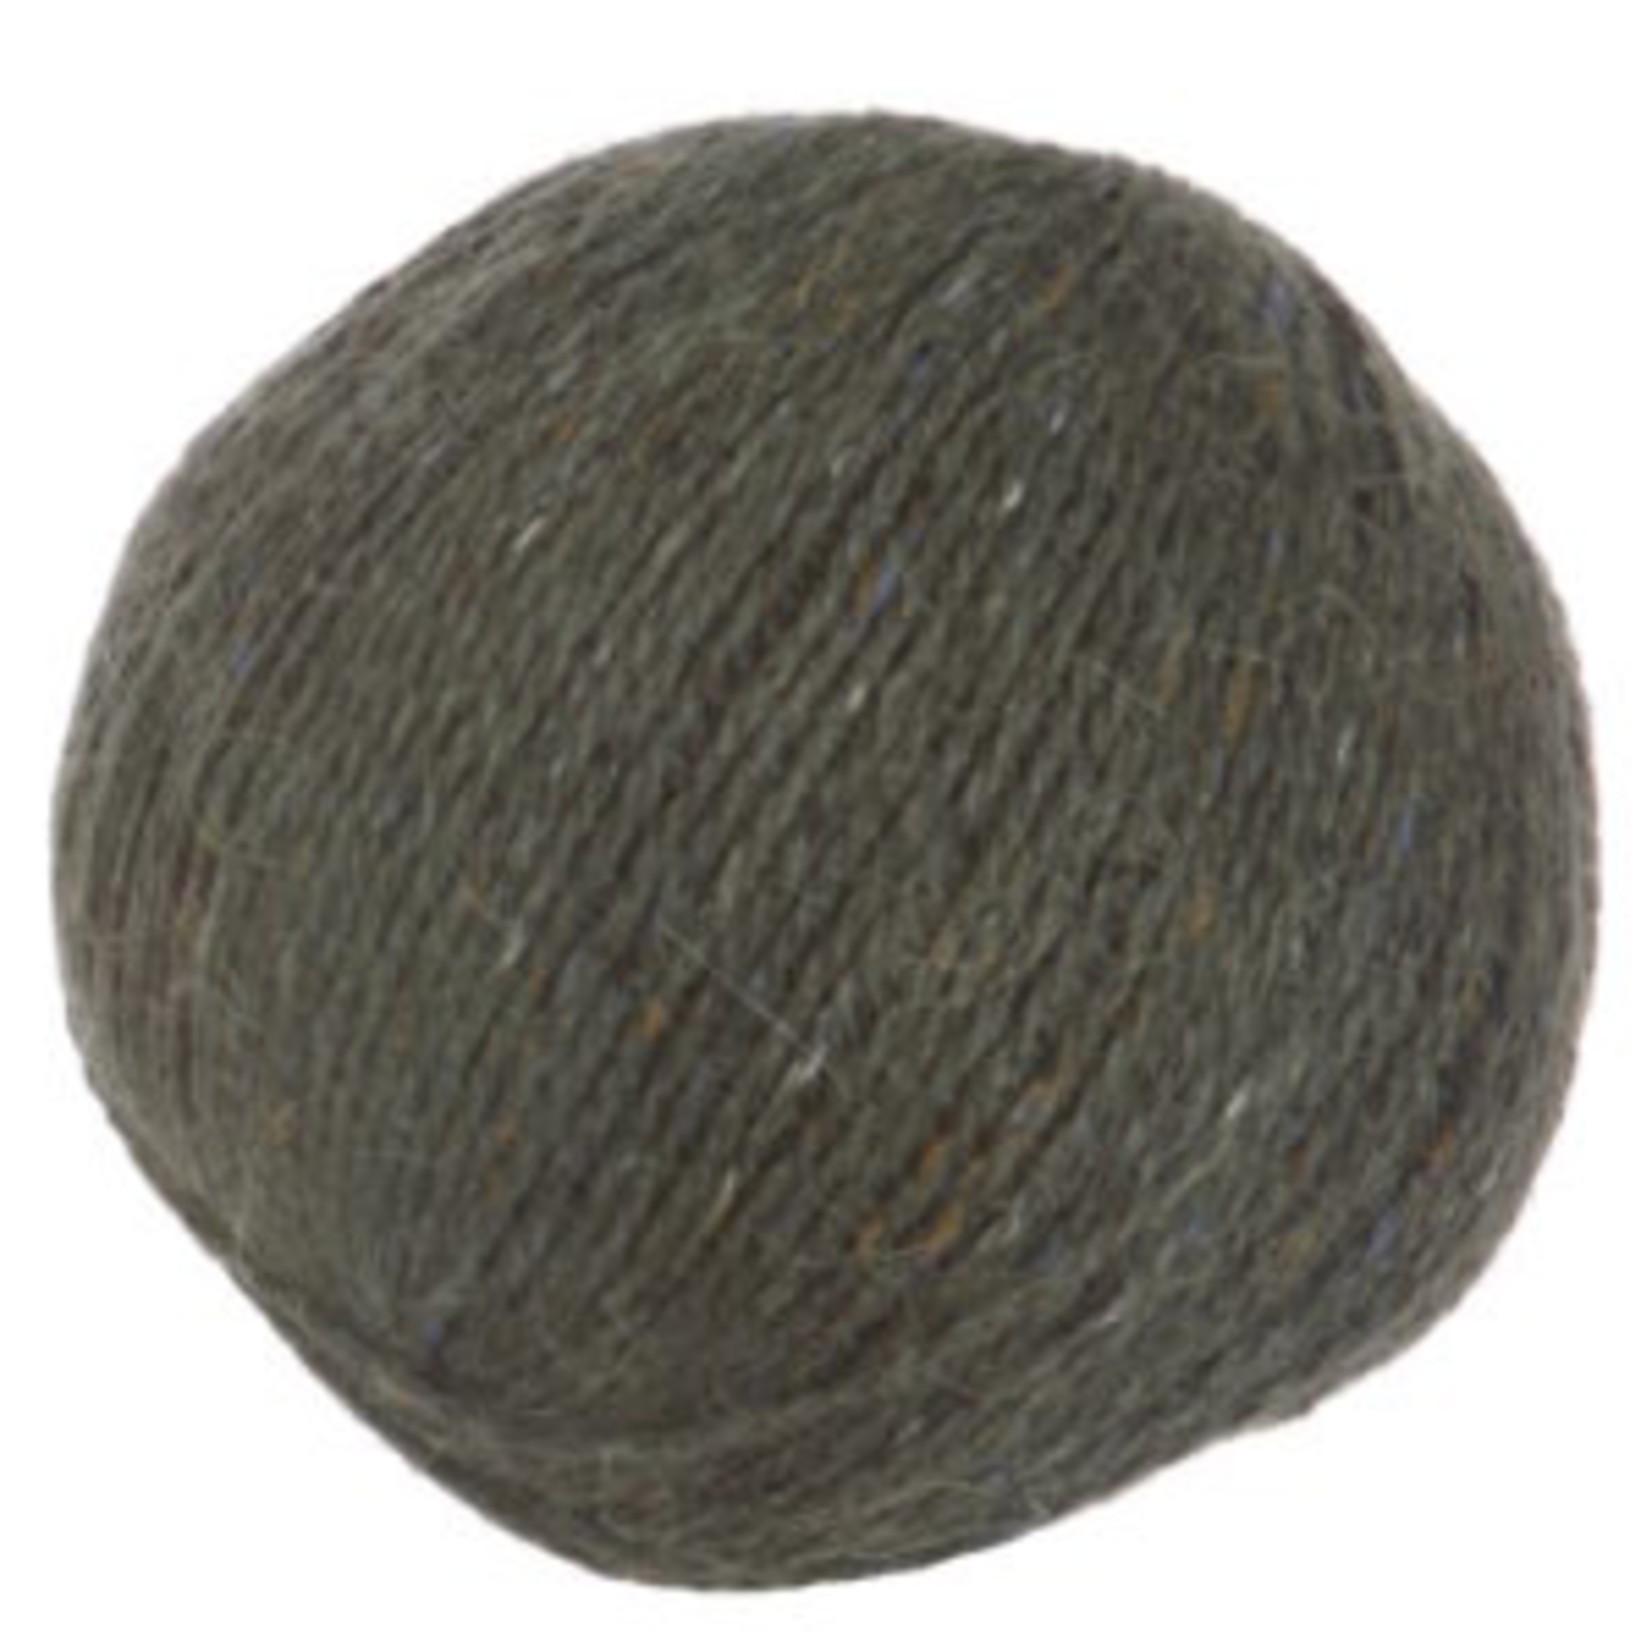 Sirdar Spinning Felted Tweed, 172, Ancient